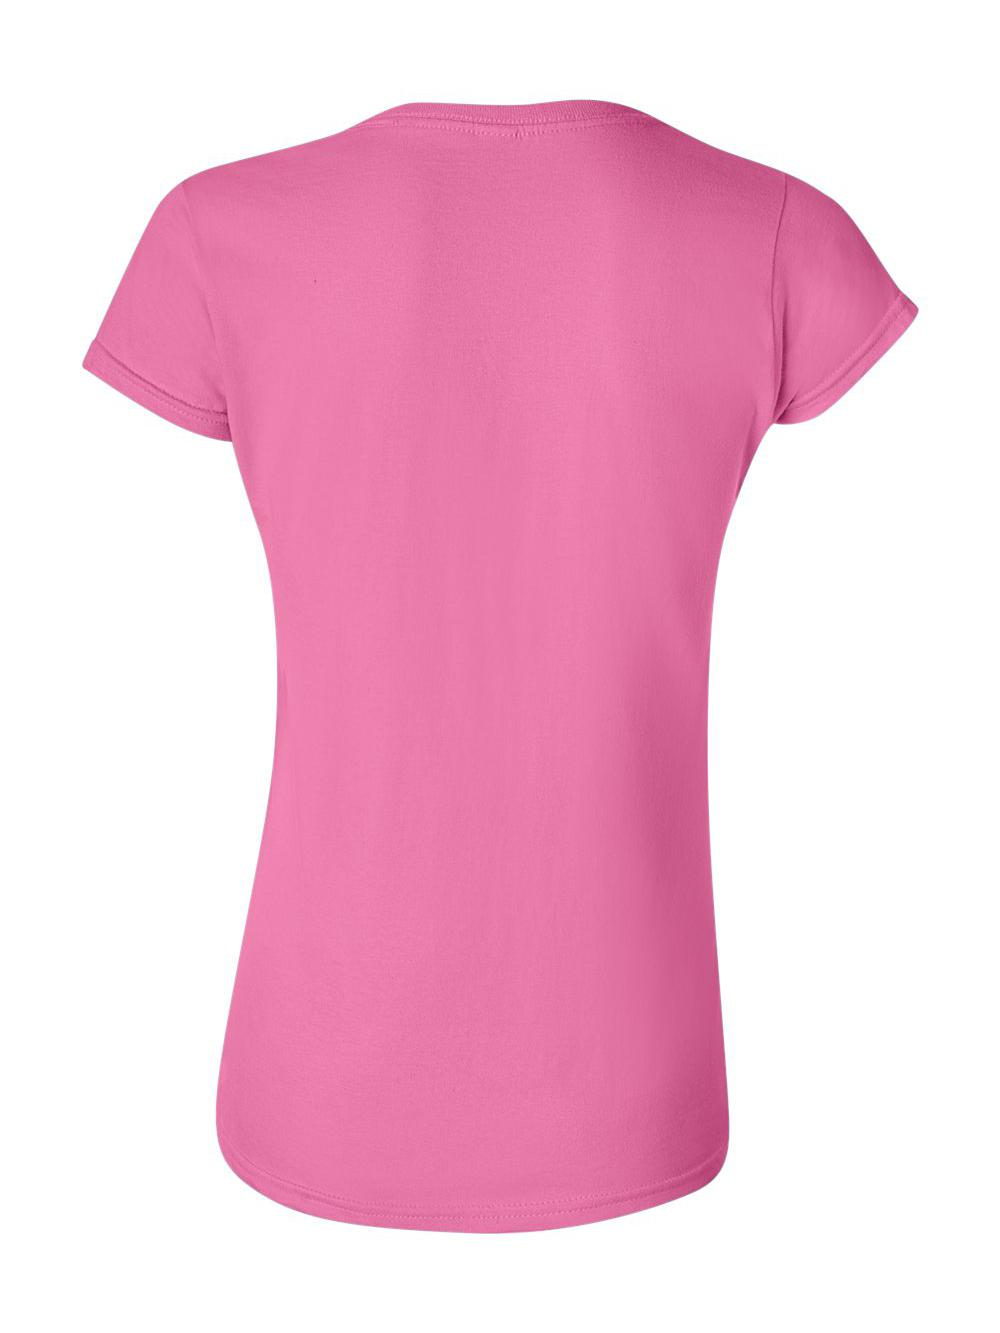 Gildan-Softstyle-Women-039-s-T-Shirt-64000L thumbnail 7